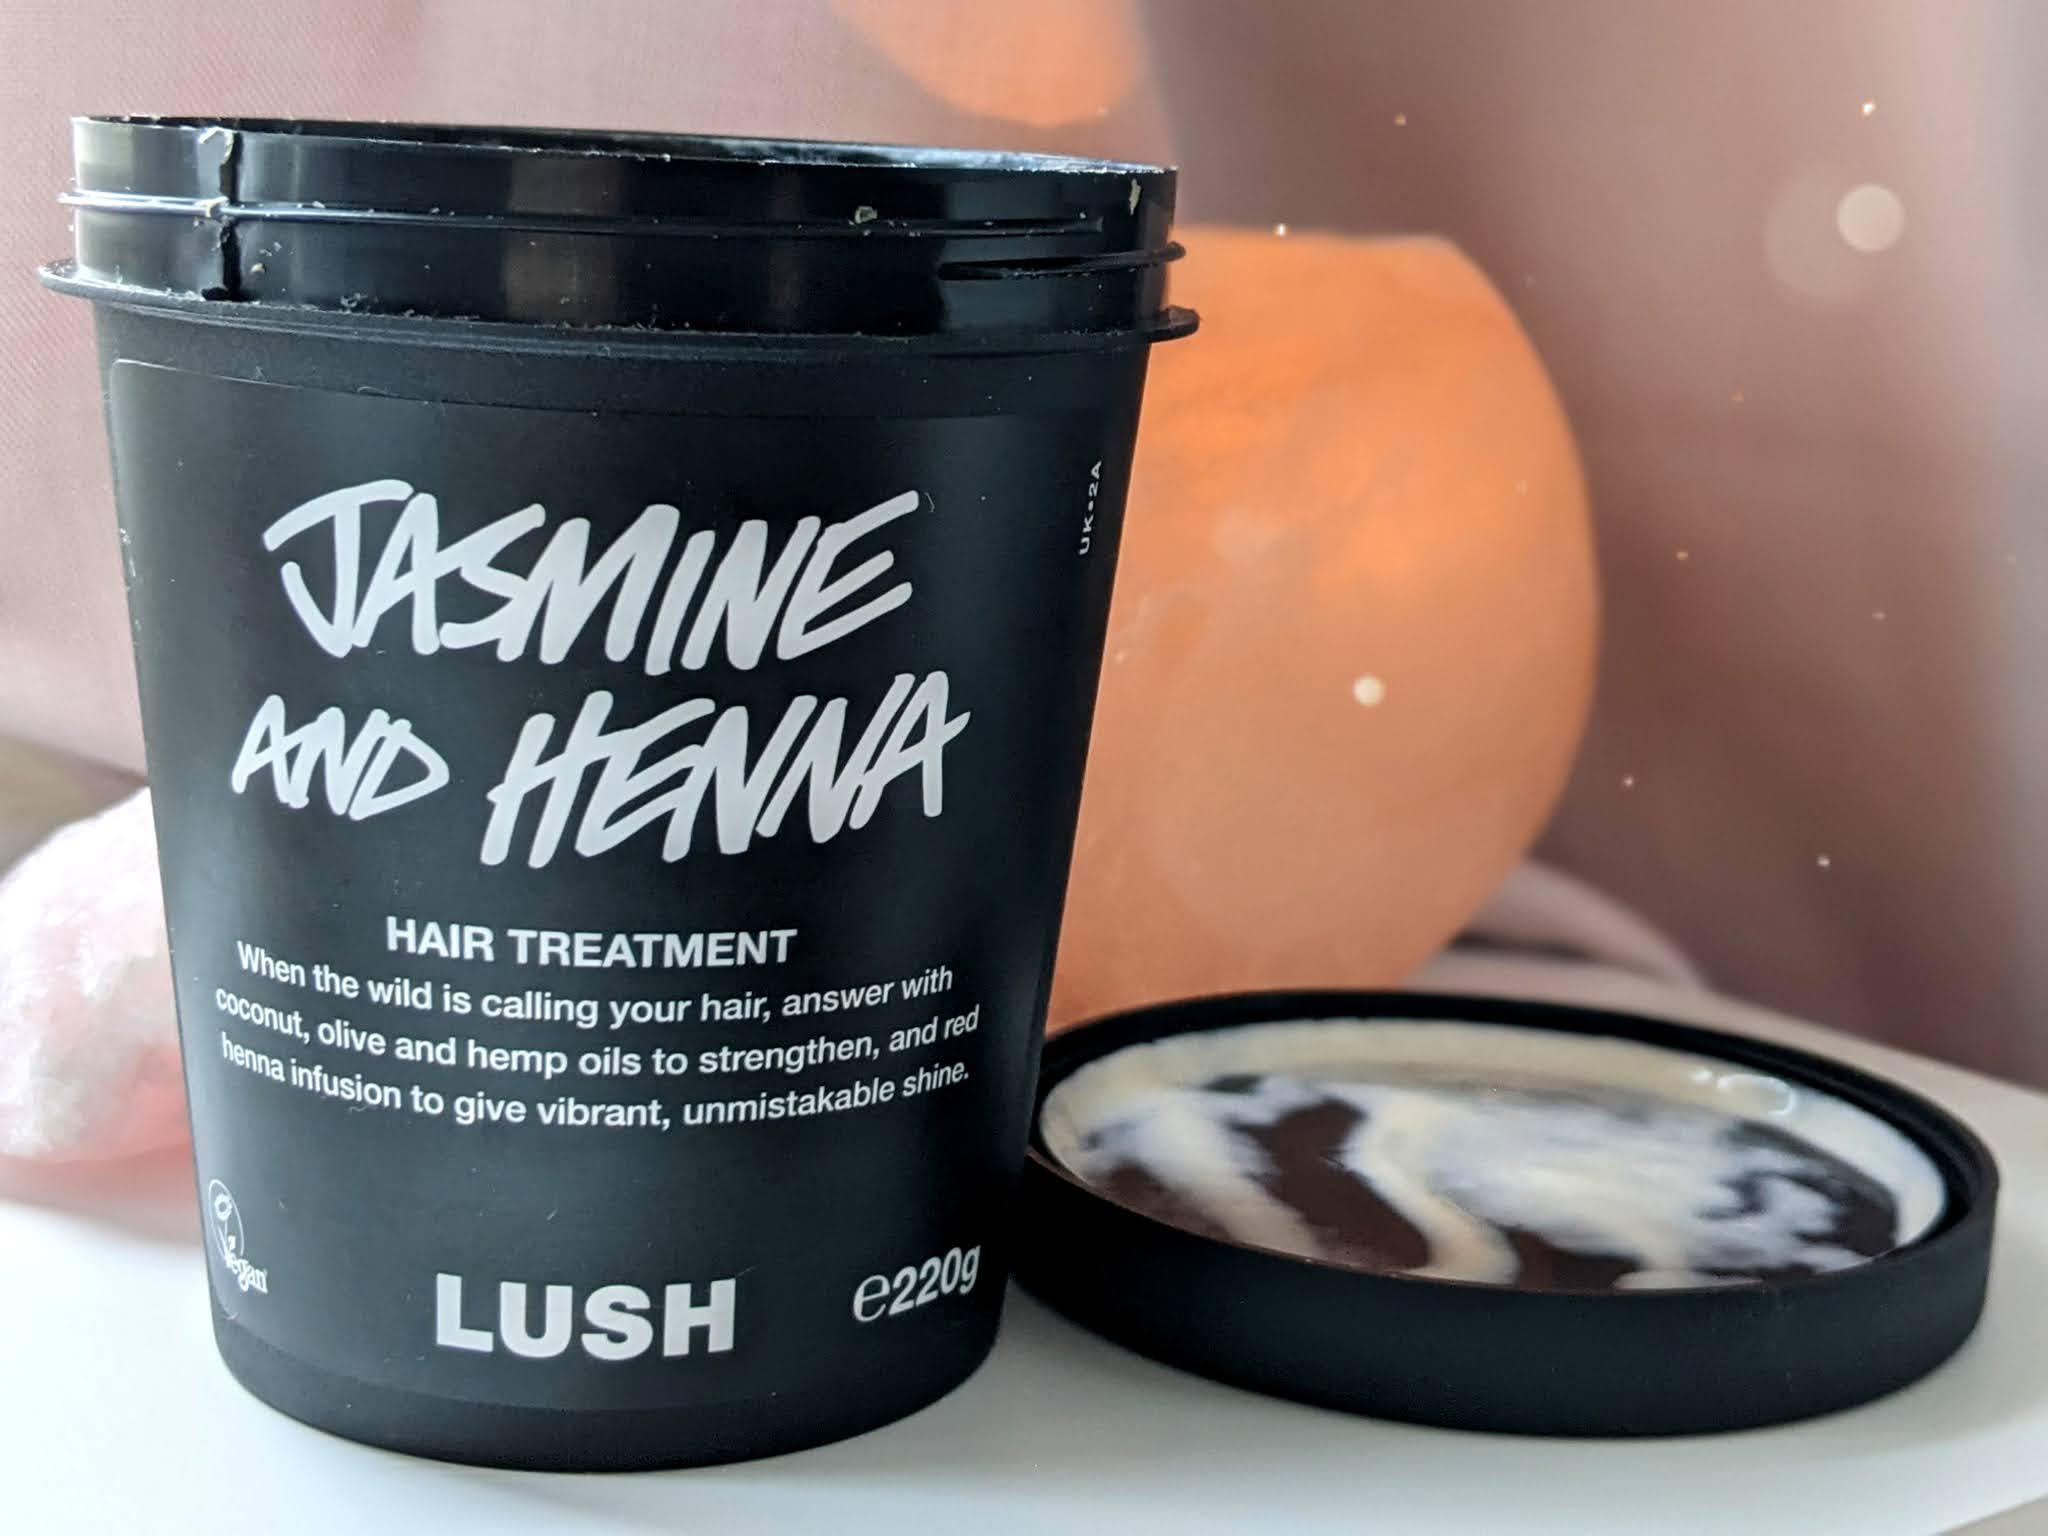 Vegan cruelty free beauty skincare favourites doodleheart.co.uk veganuary Lush Jasmine and henna